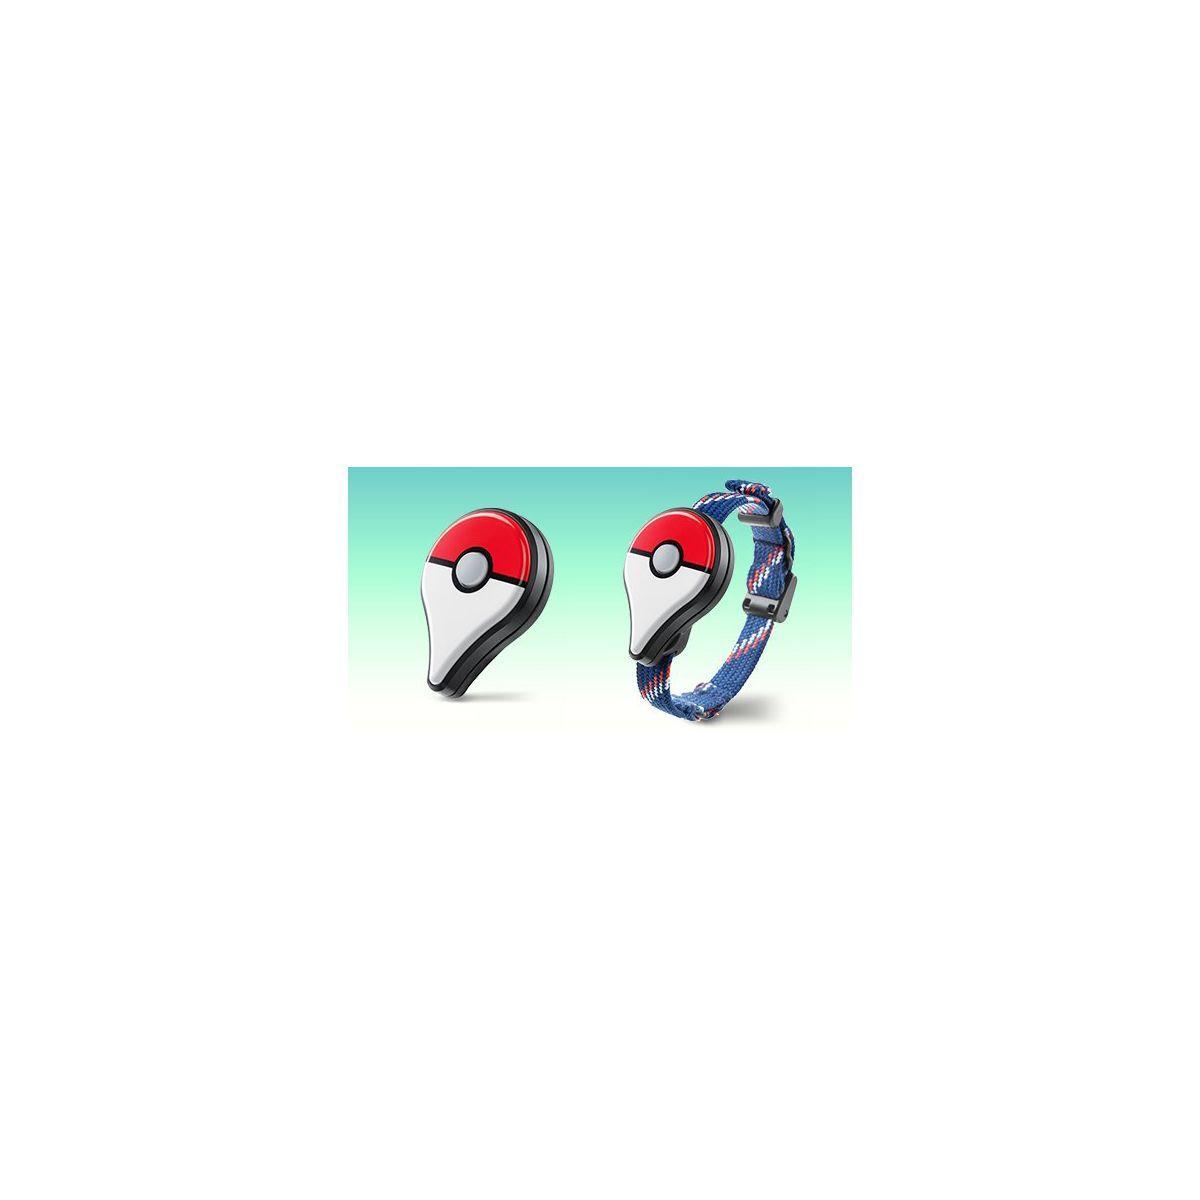 Bracelet nintendo pokemon go plus - 3% de remise immédiate avec le code : multi3 (photo)